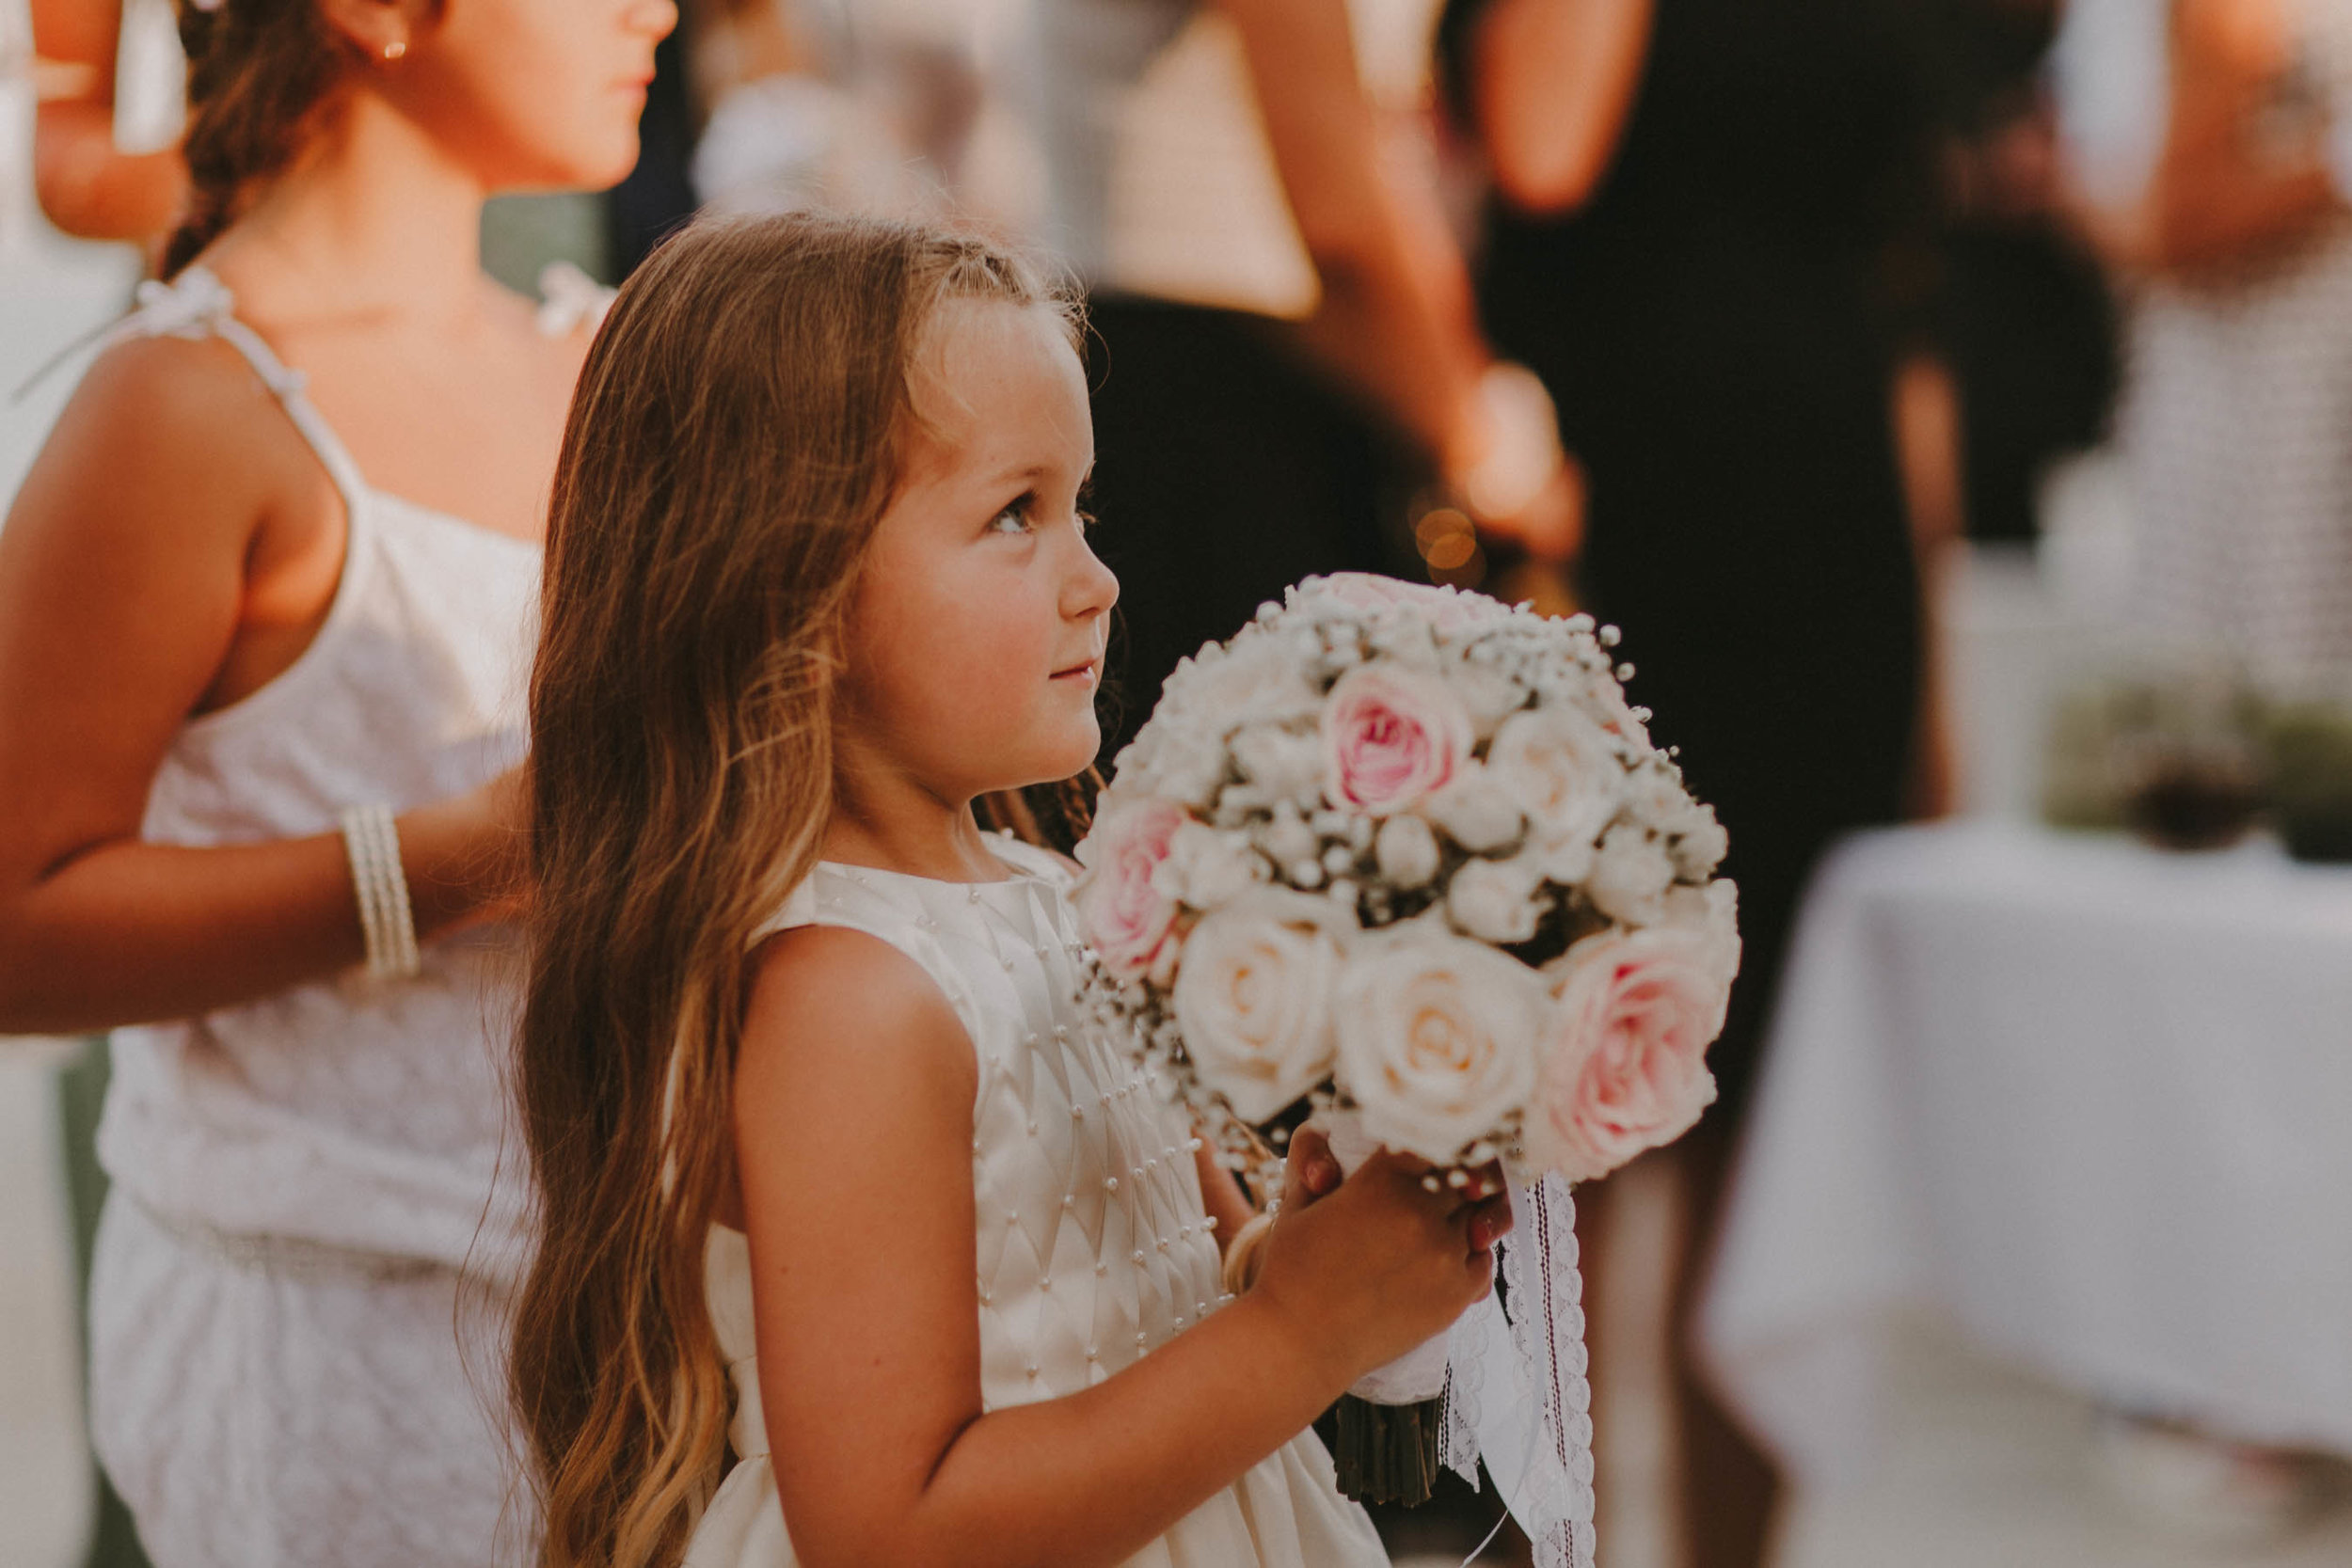 sylvia&dimitri-Wedding-Crvena_Luka-Croatia-60(6458).jpg